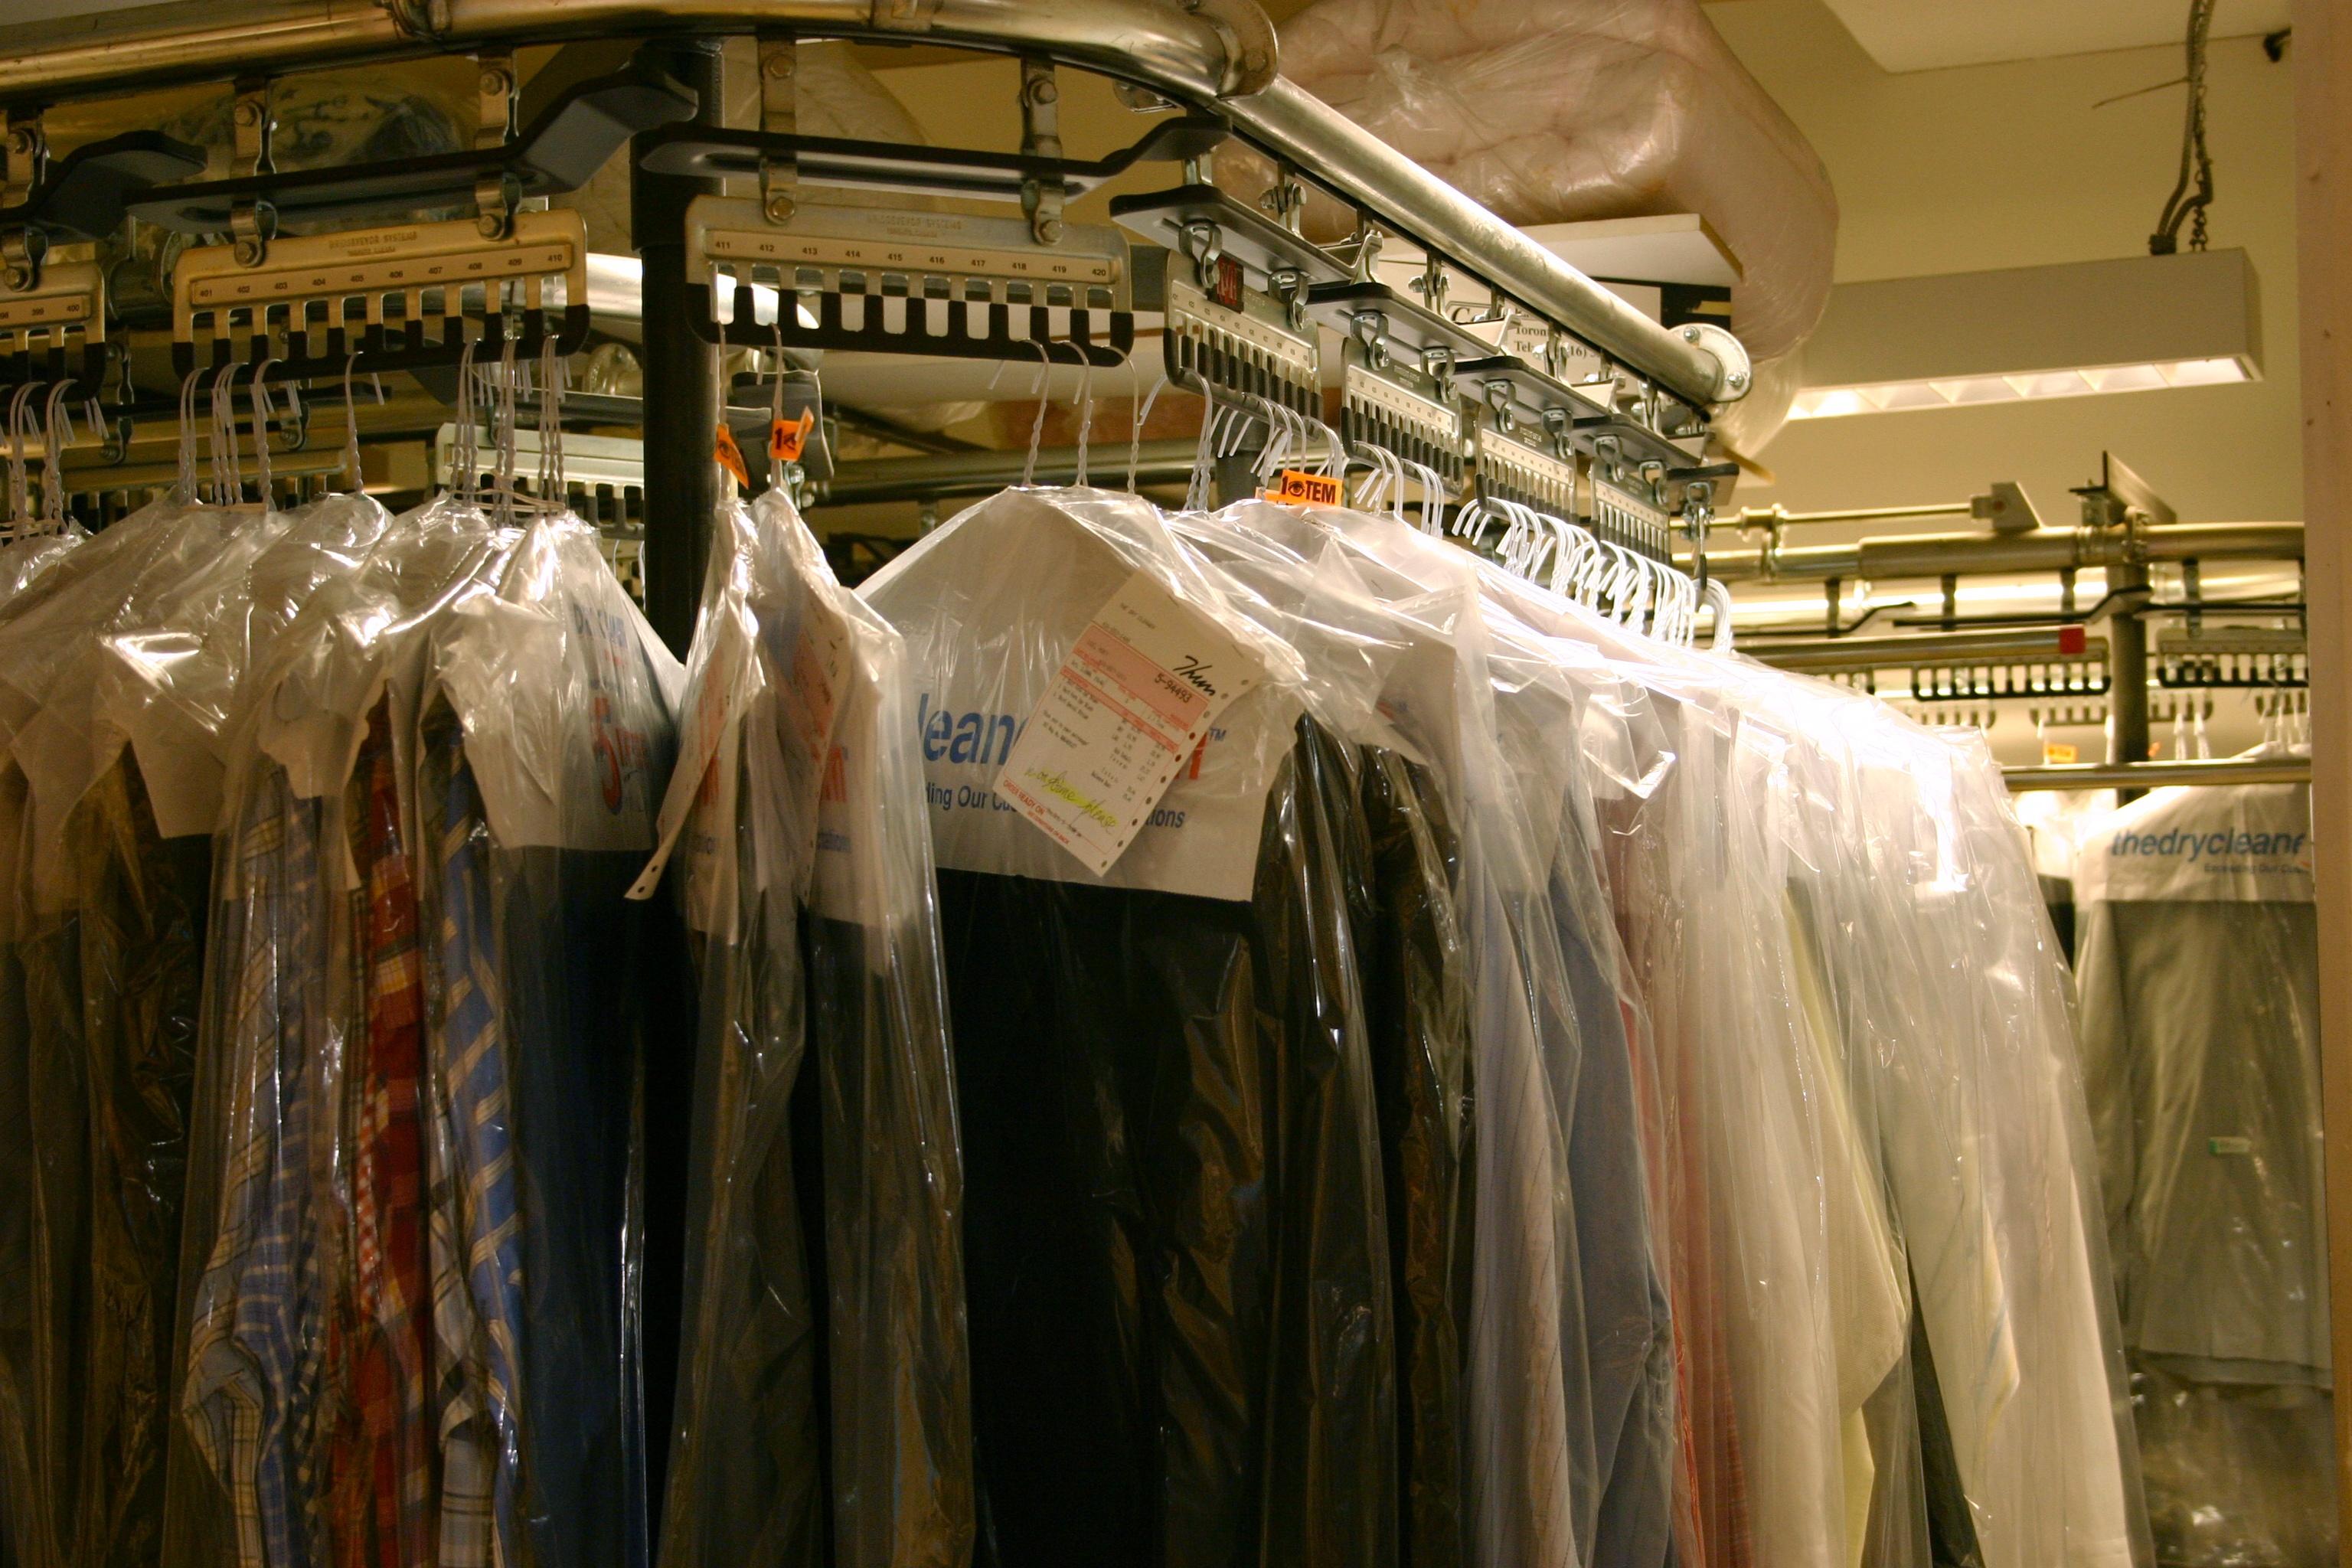 Cloth in plastic bags